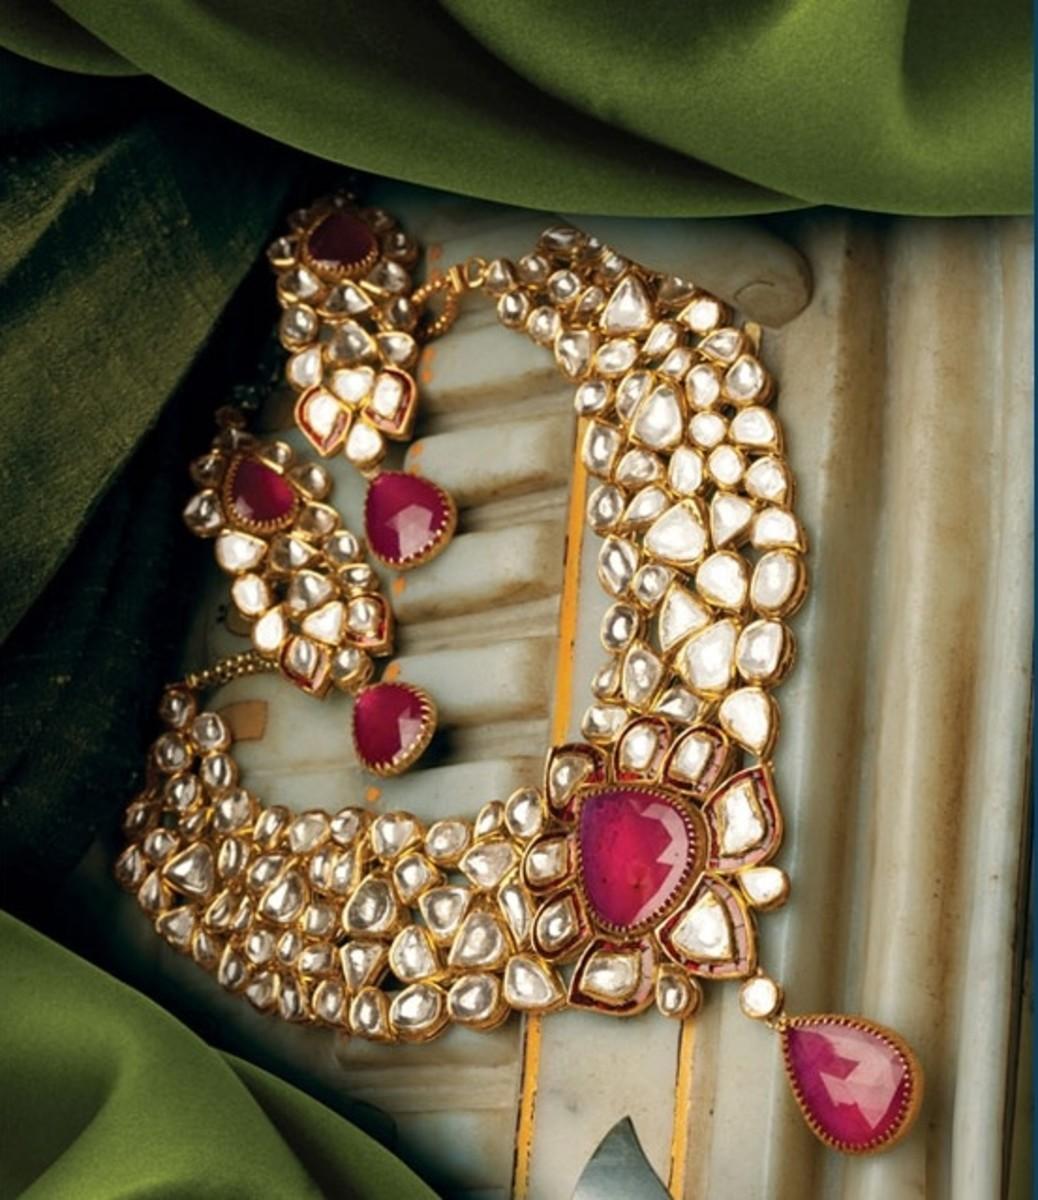 Kundan short necklace with magenta center stone